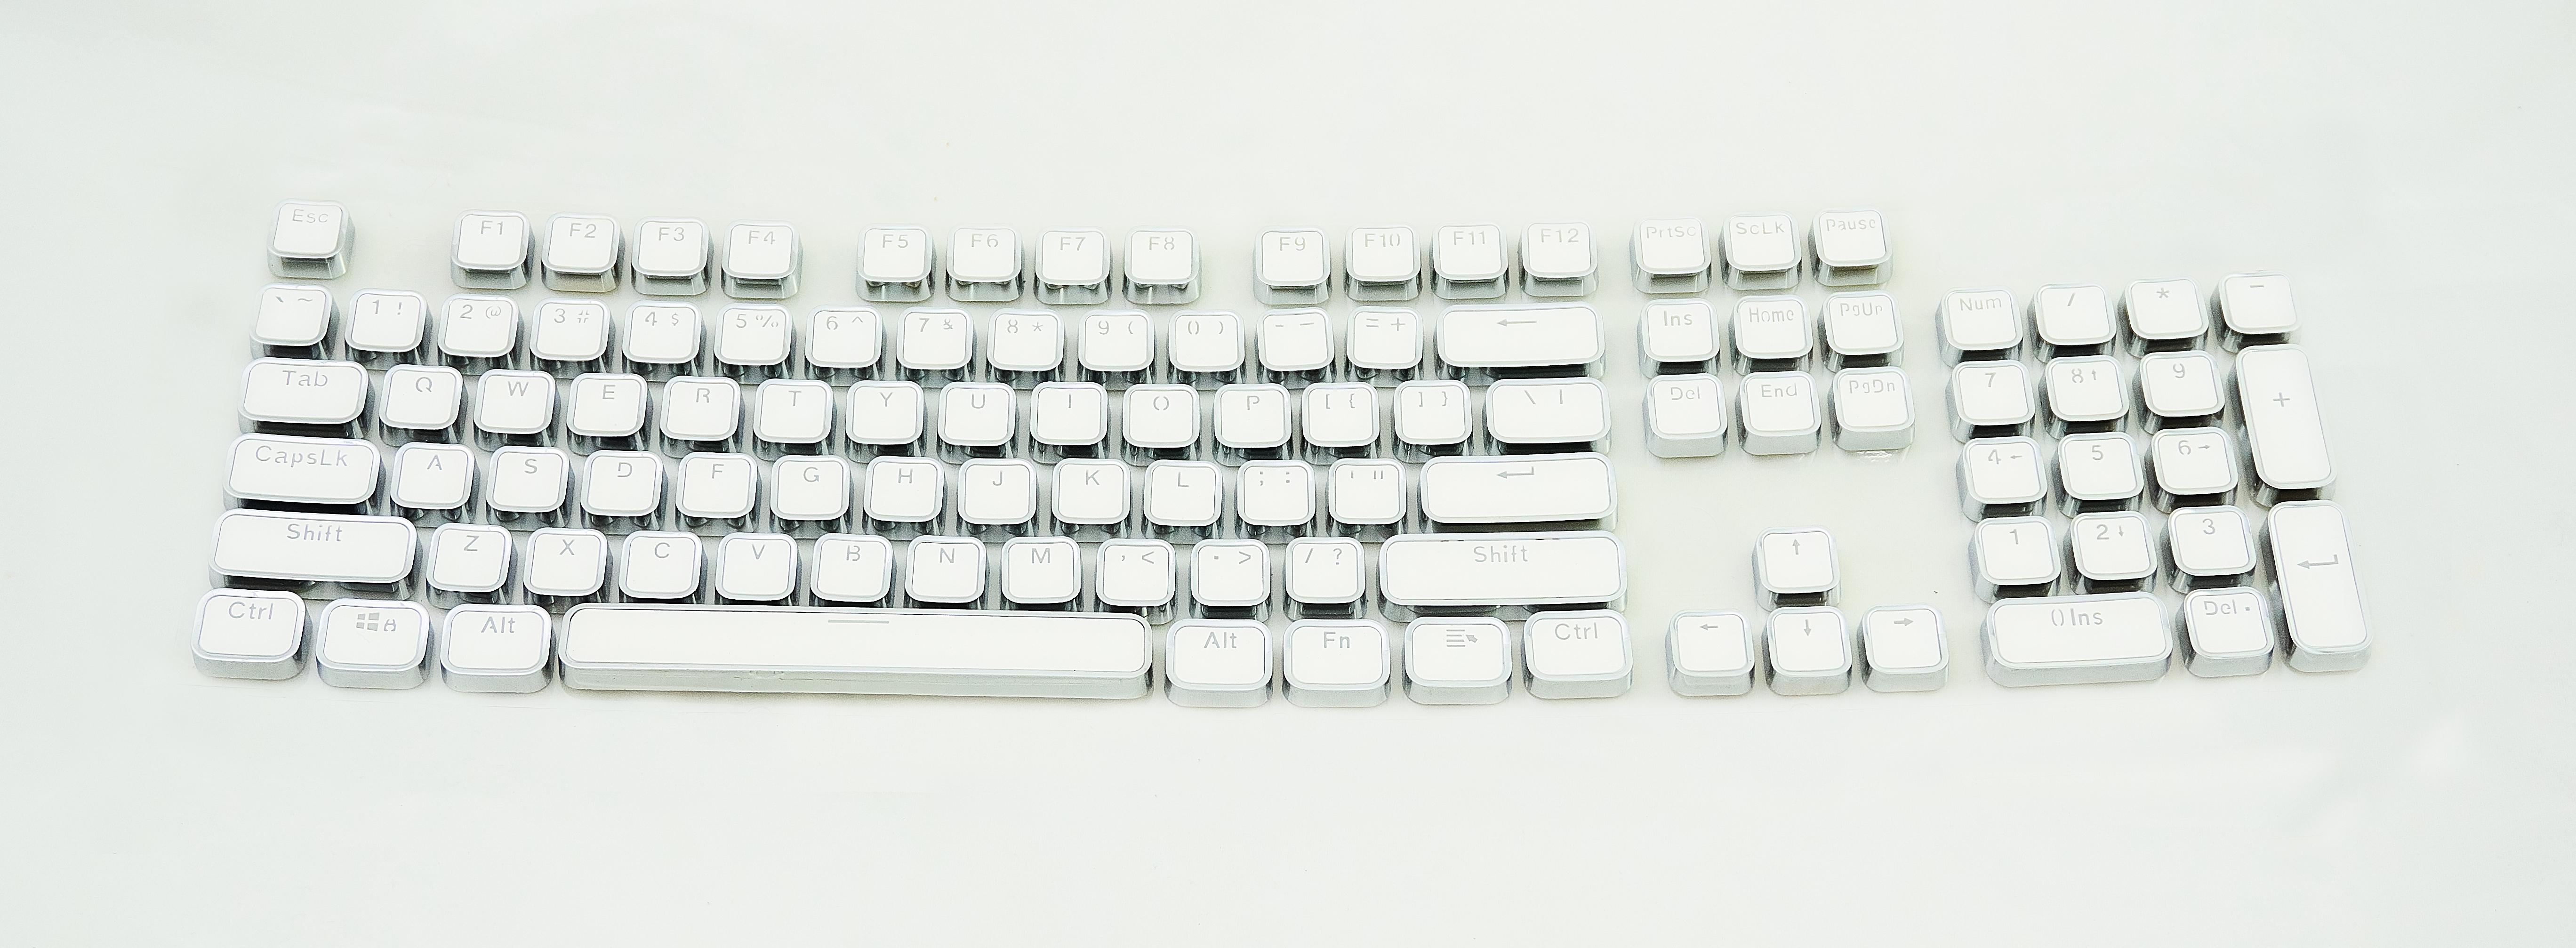 Keycap Branco Prateado Tecla para Teclado Mecânico